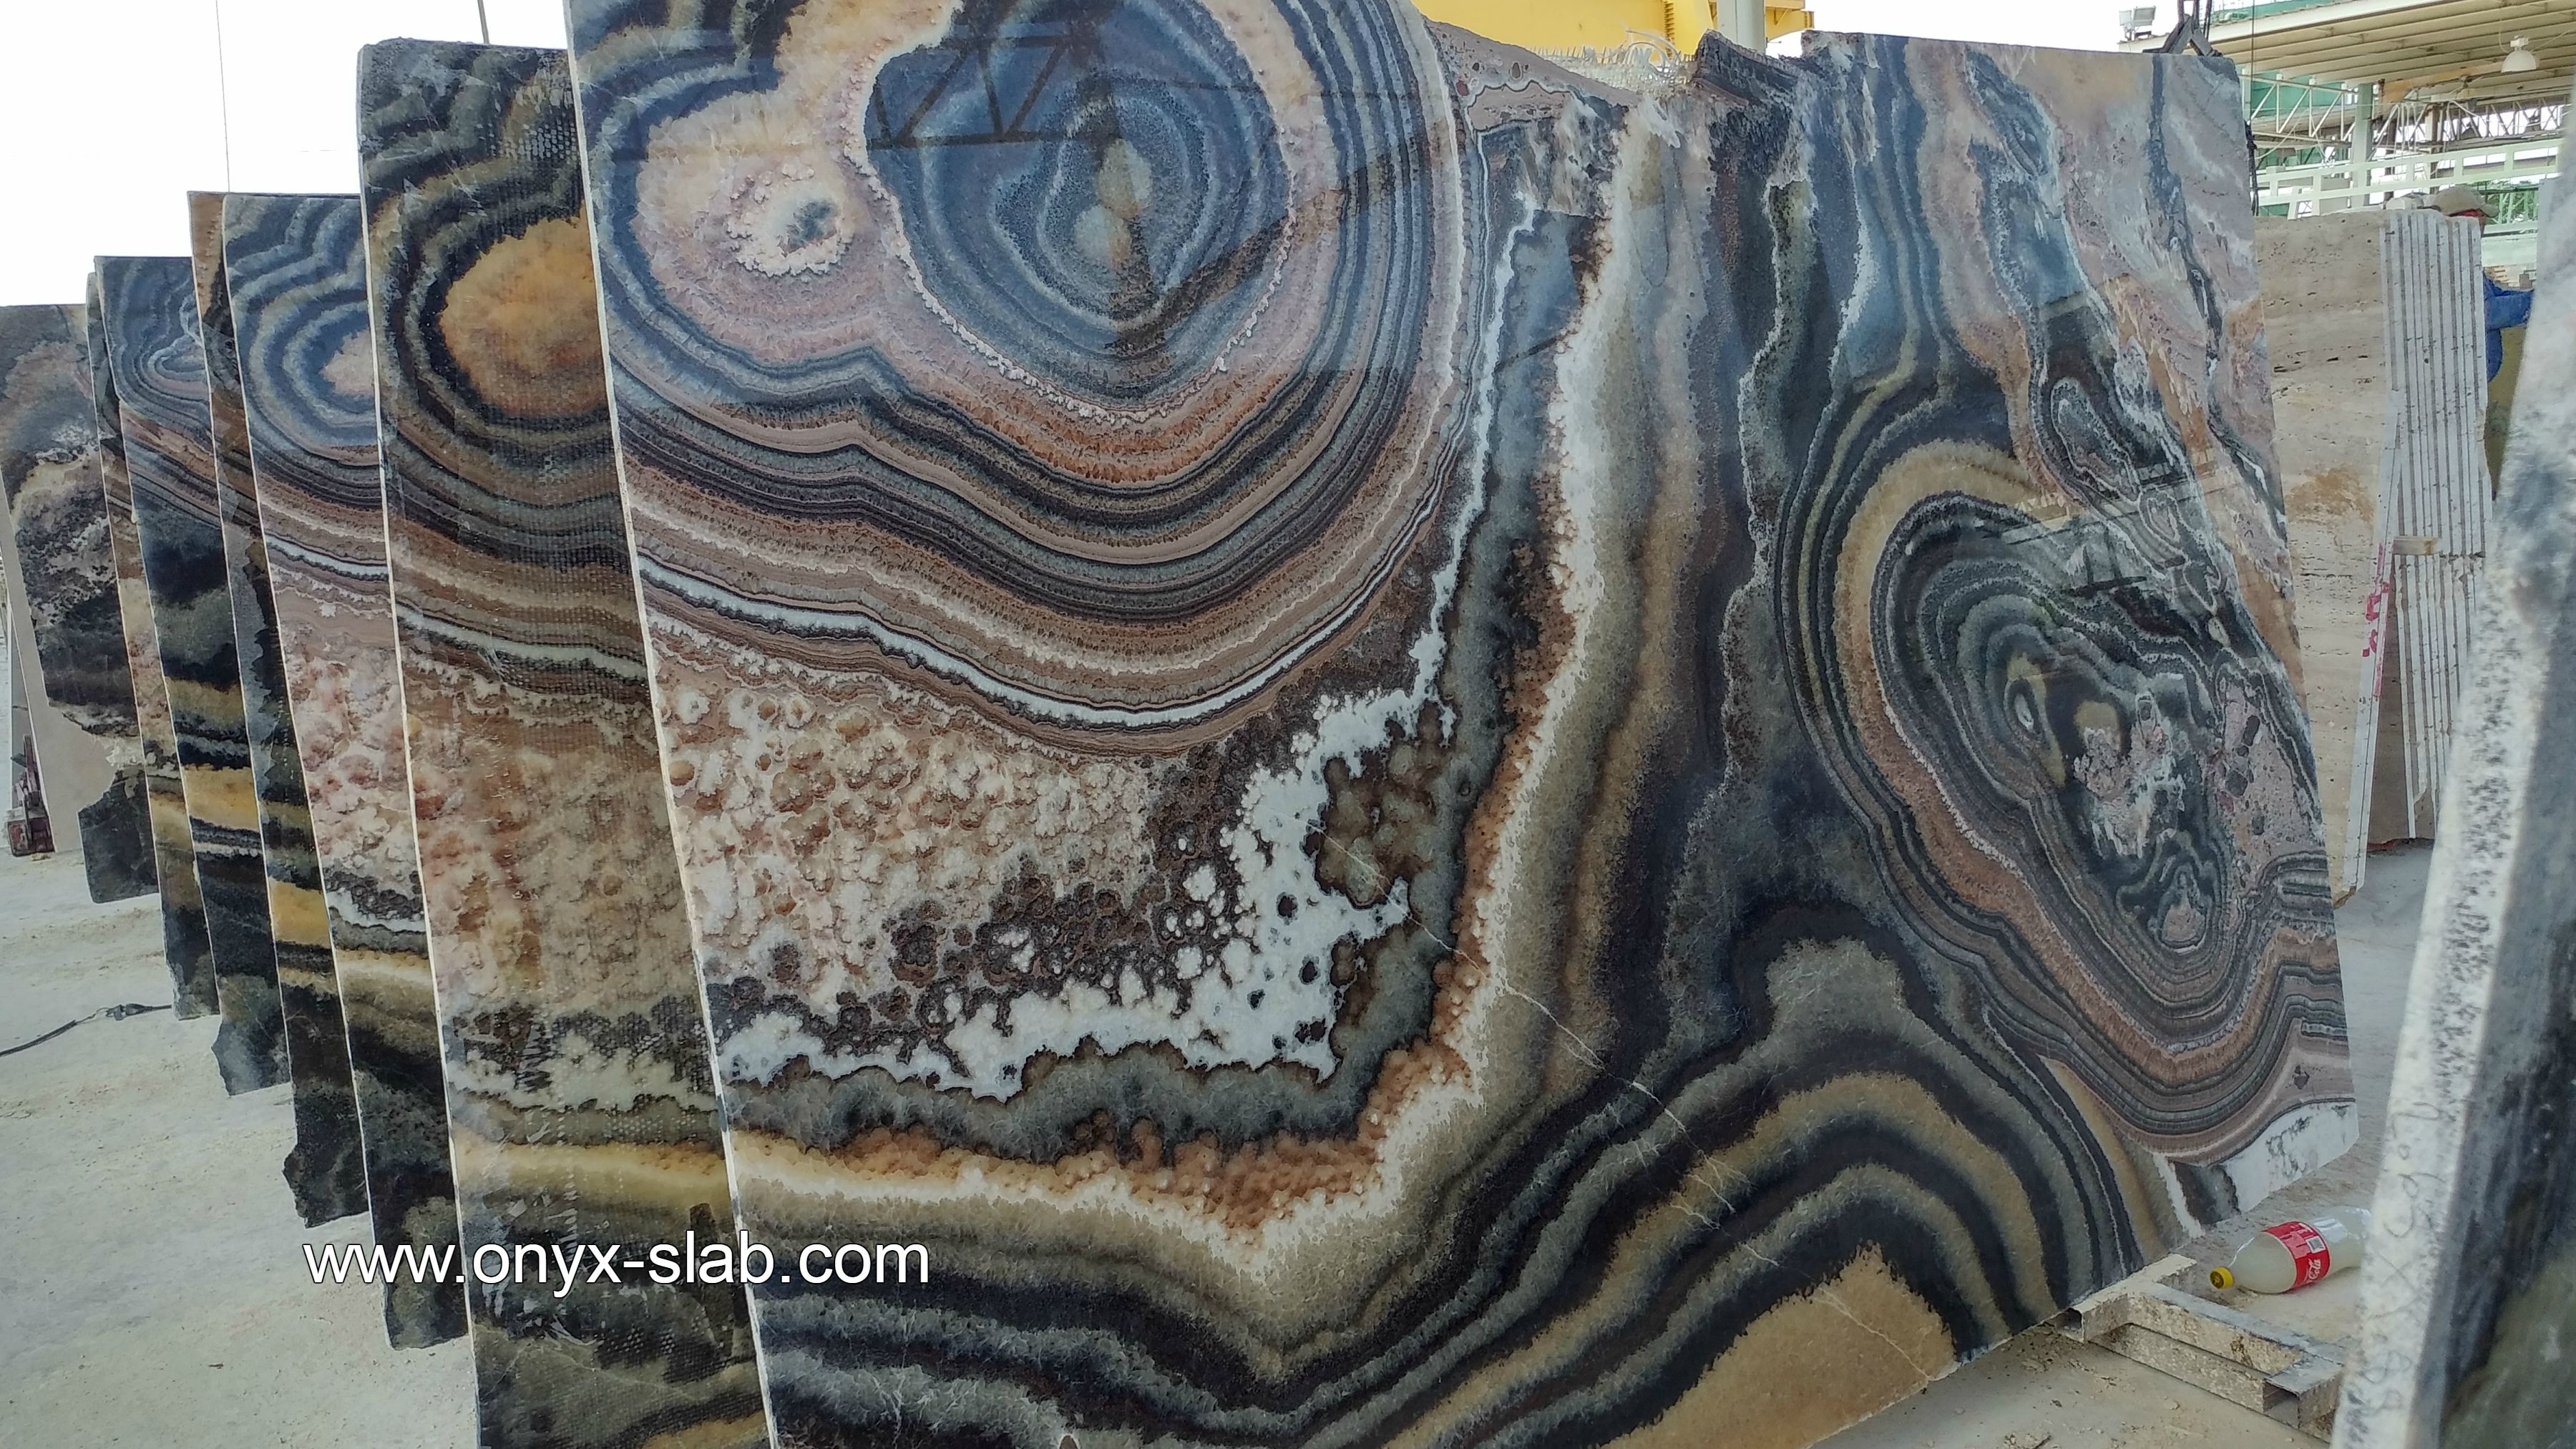 Black Onyx Slabs Direct Factory Price Cel Whatsapp 521 871 118 7030 Https Www Onyx Slab Com Black Onyx Sl Slab Granite Countertops Bathroom Vanity Tops Onyx